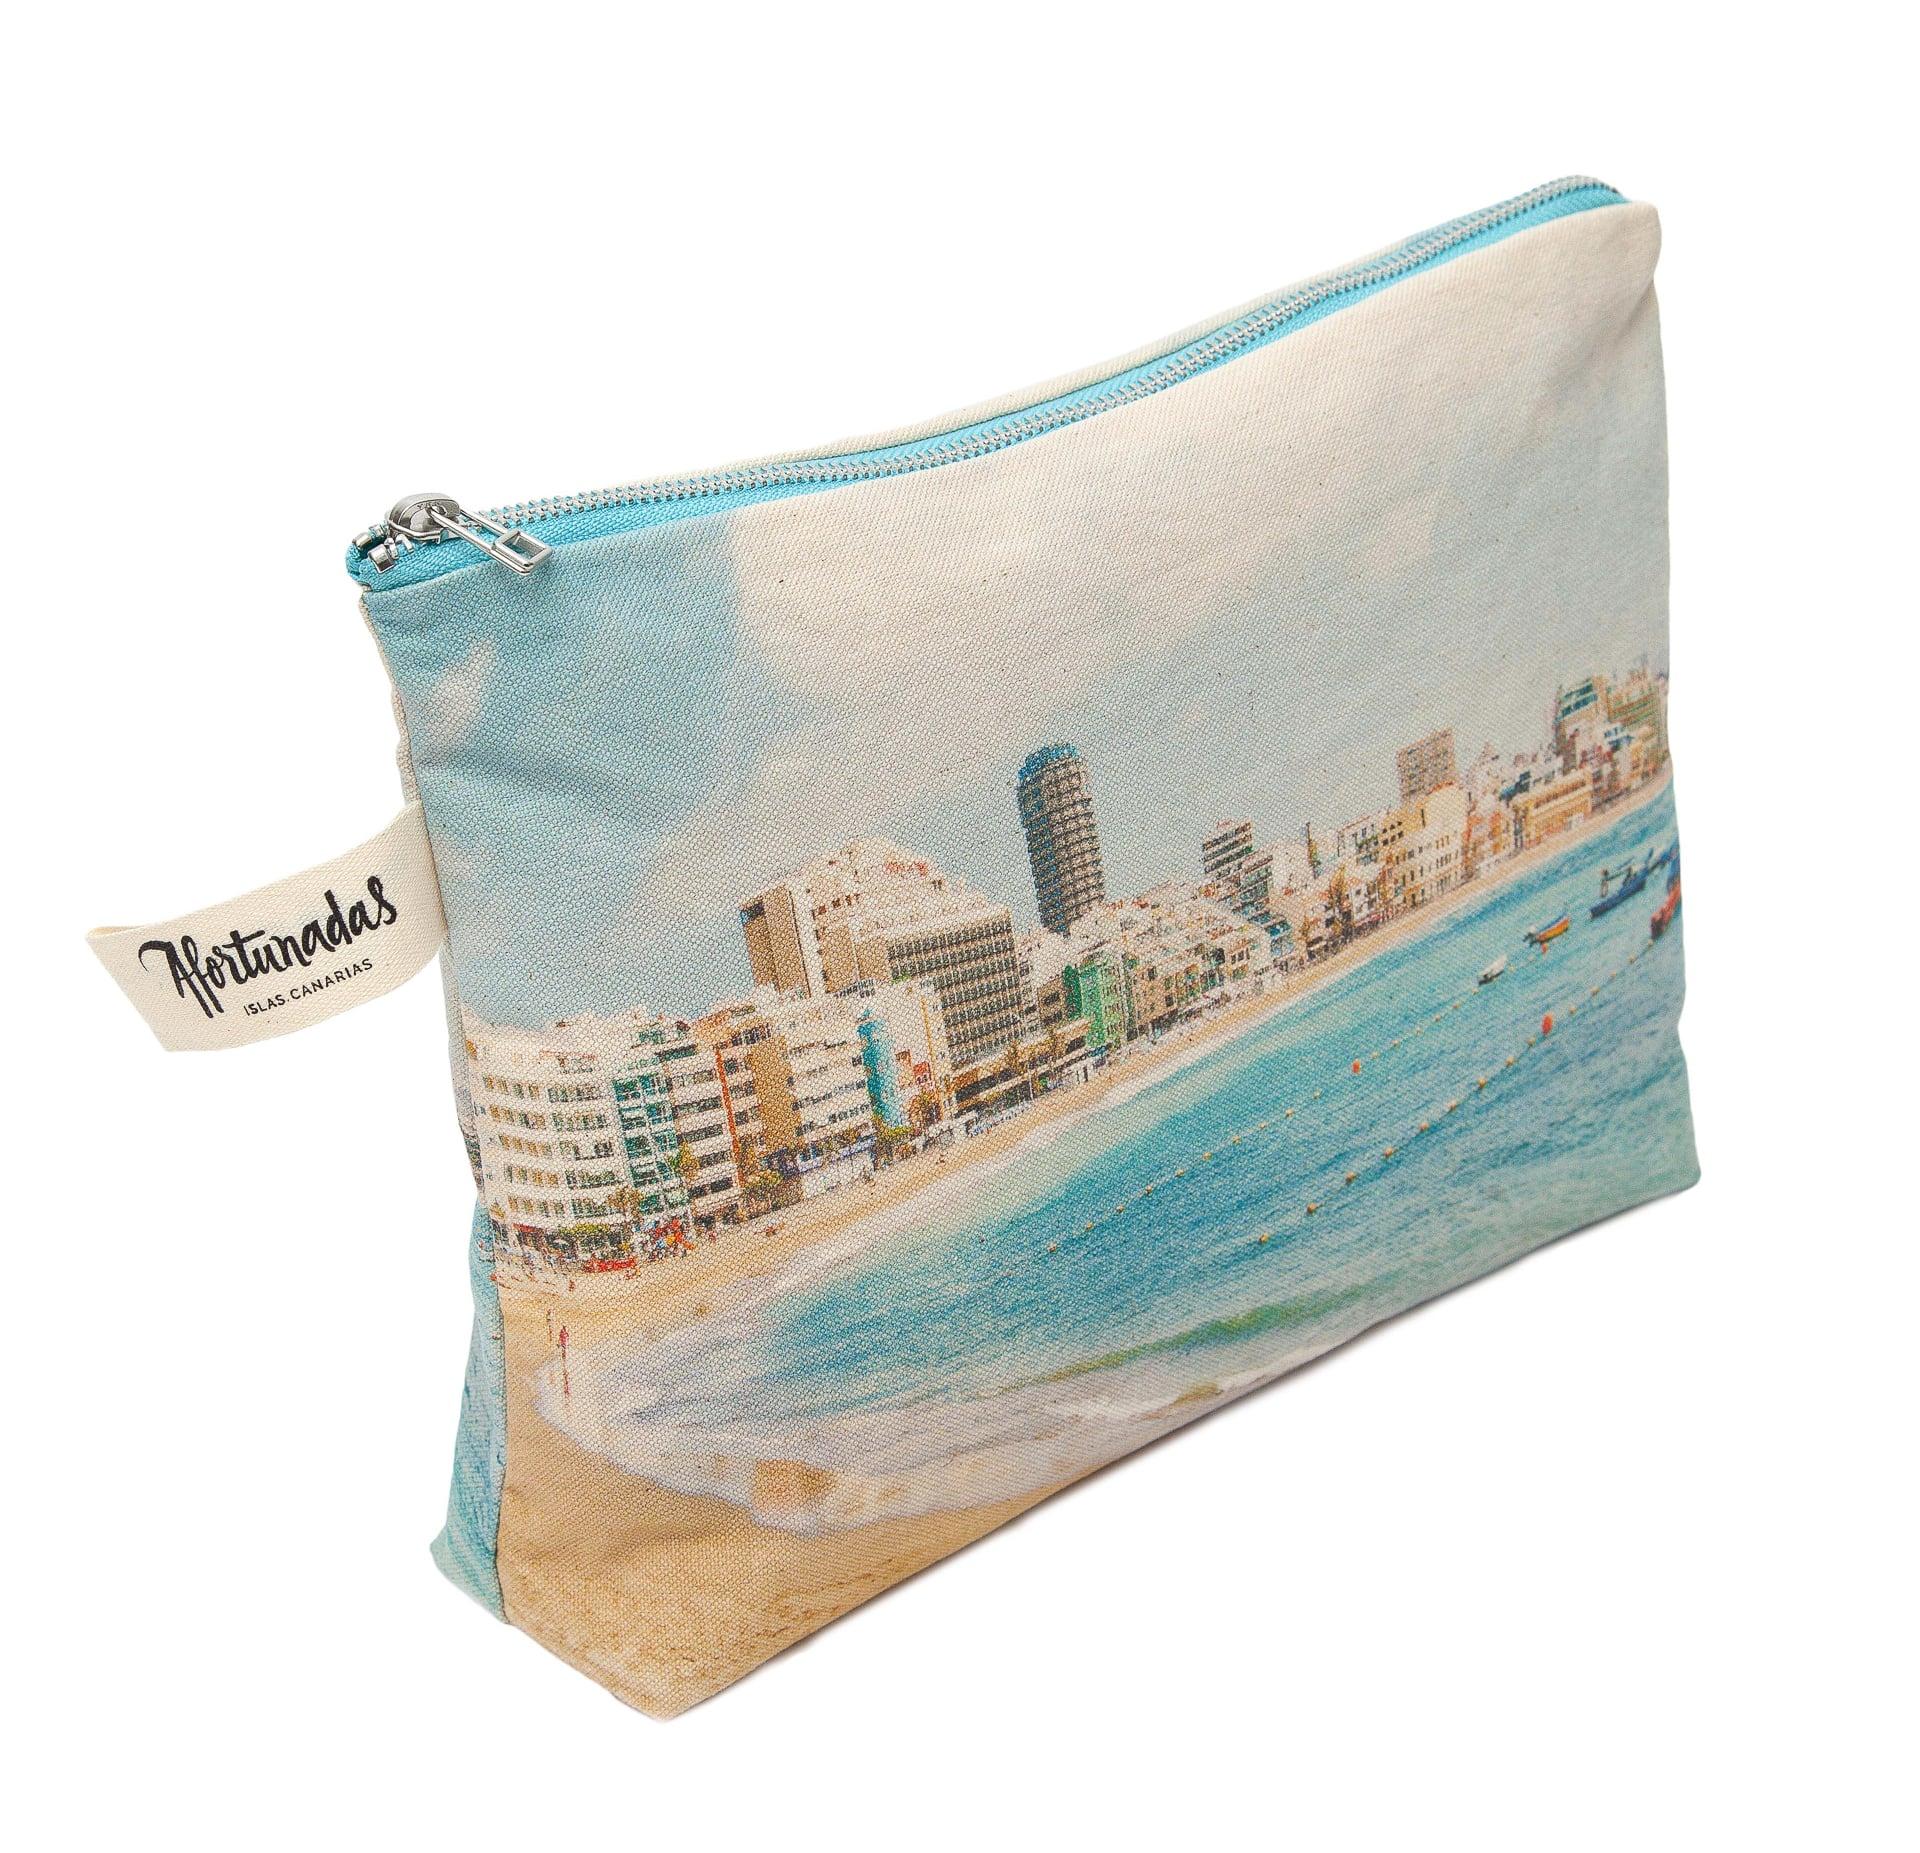 Las_Canteras-side-pouch